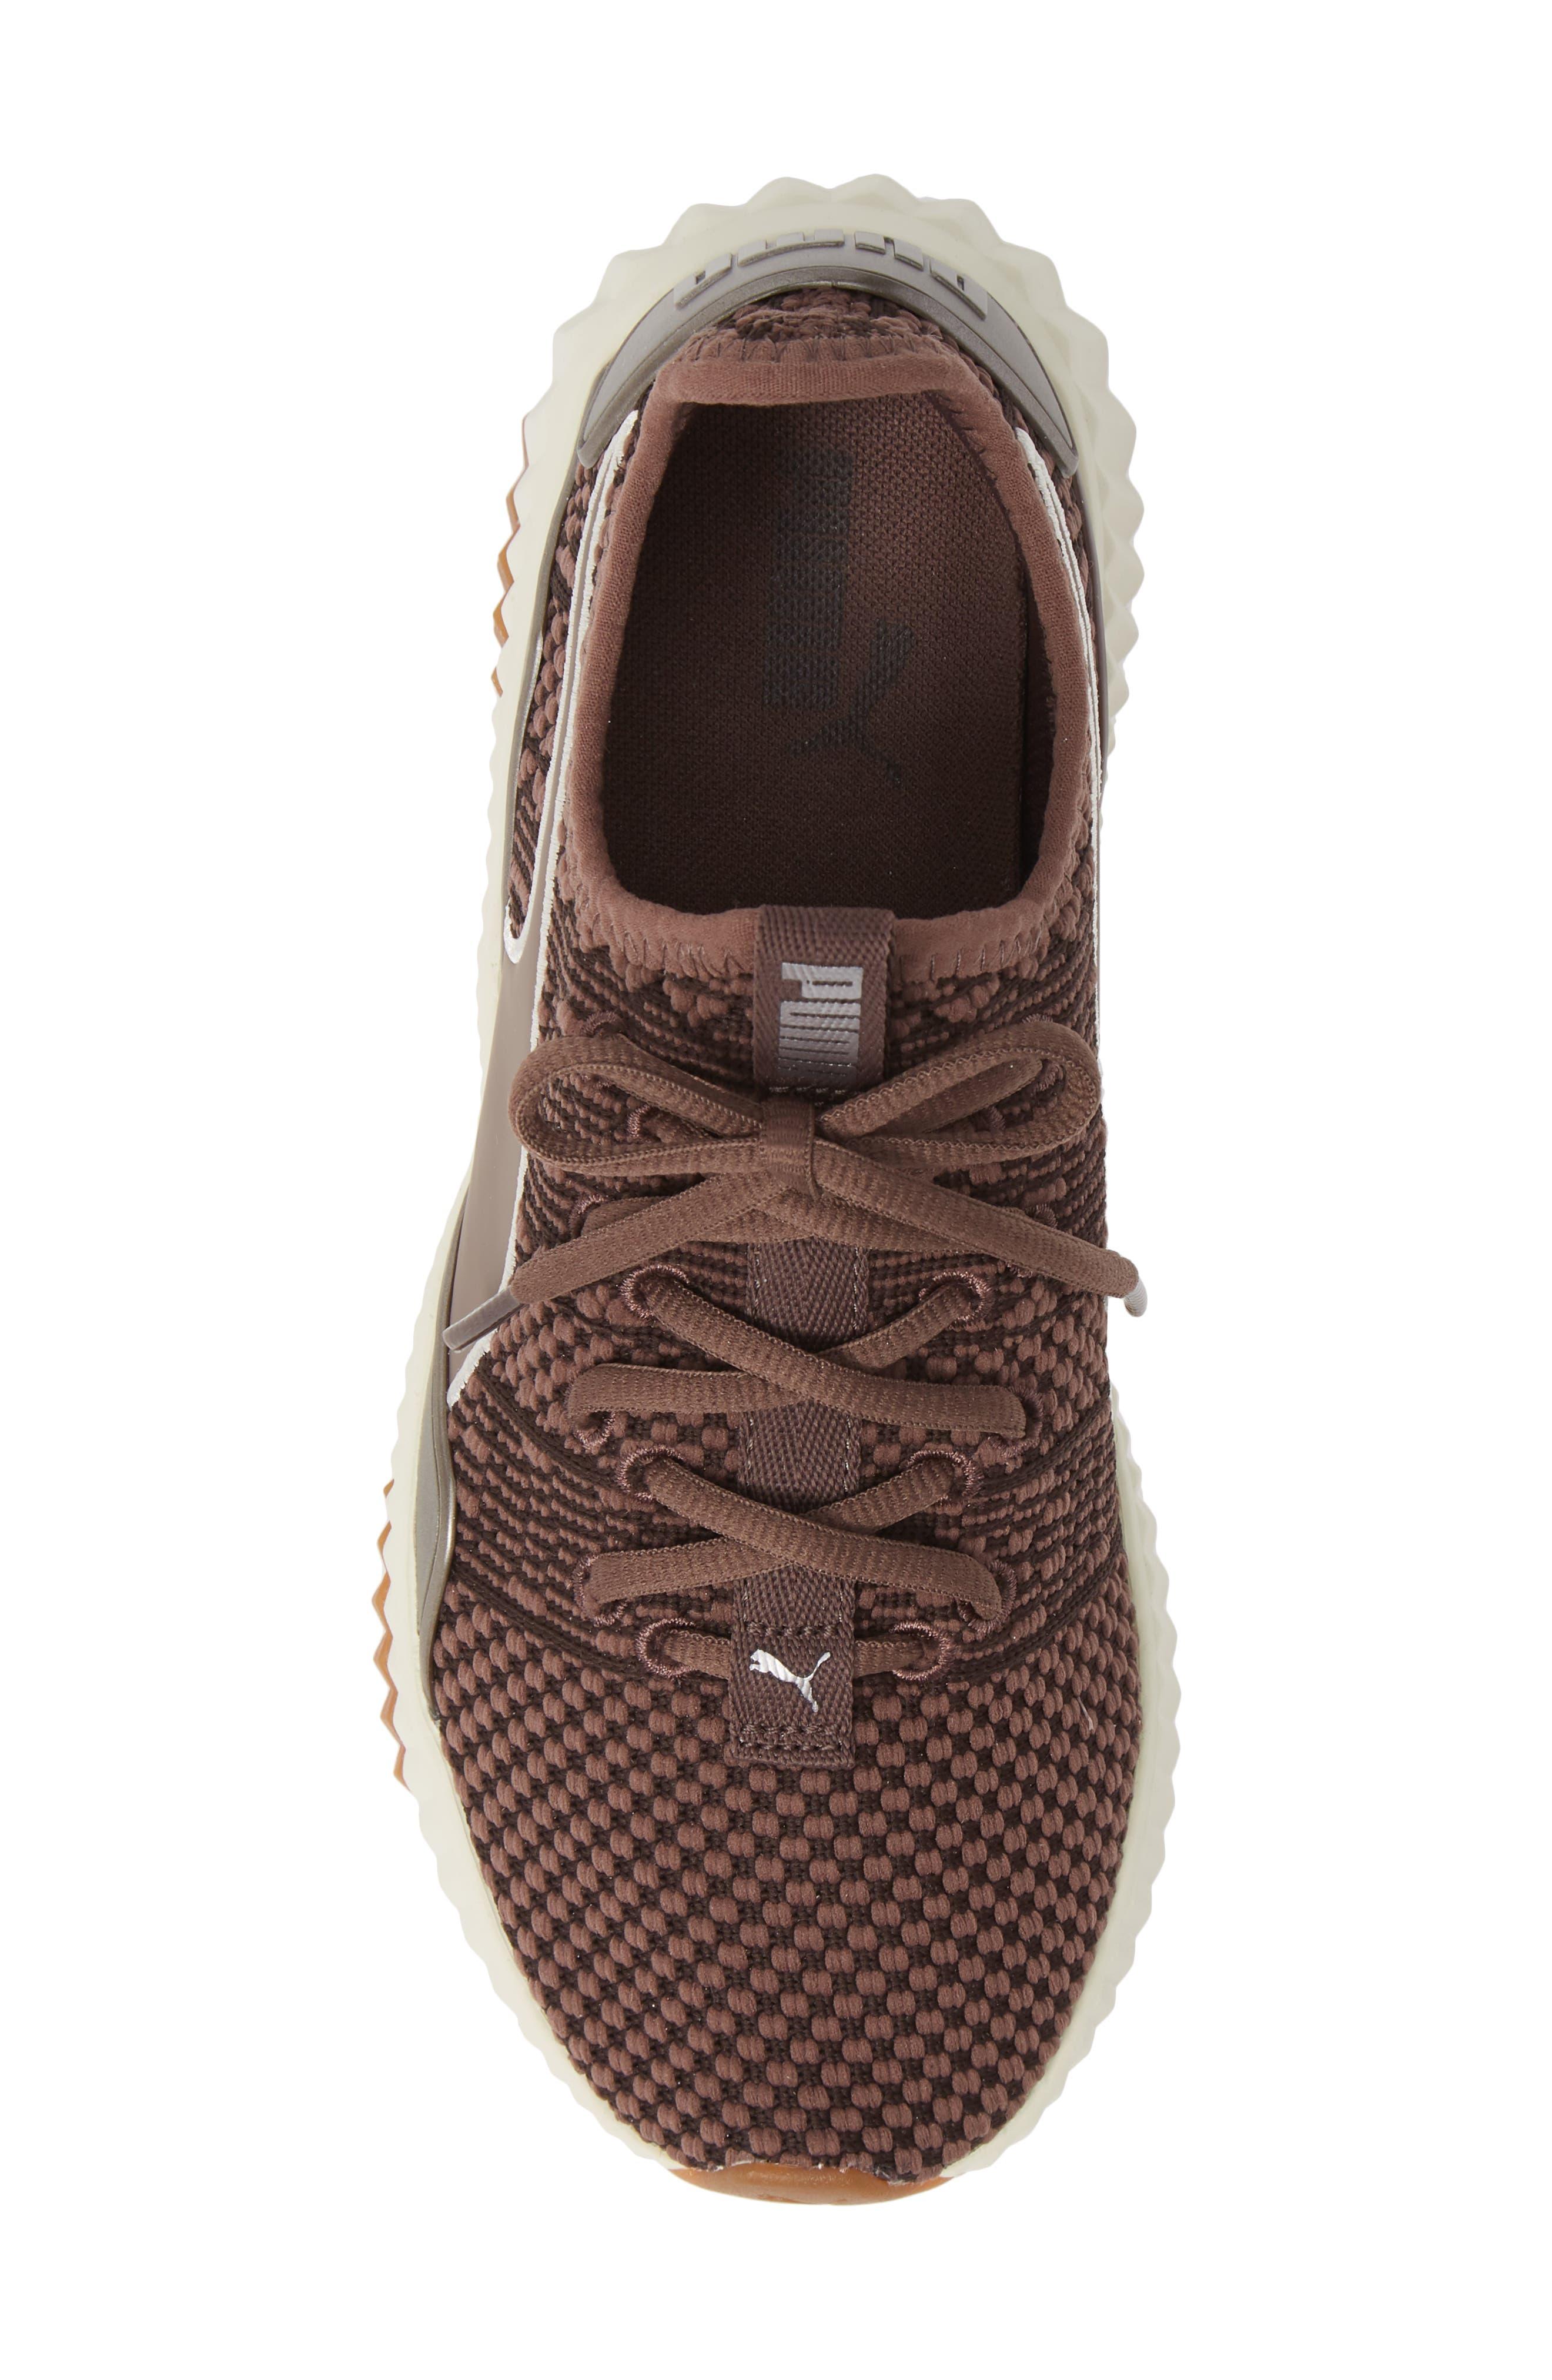 PUMA,                             Defy Luxe Sneaker,                             Alternate thumbnail 5, color,                             PEPPERCORN/ METALLIC ASH